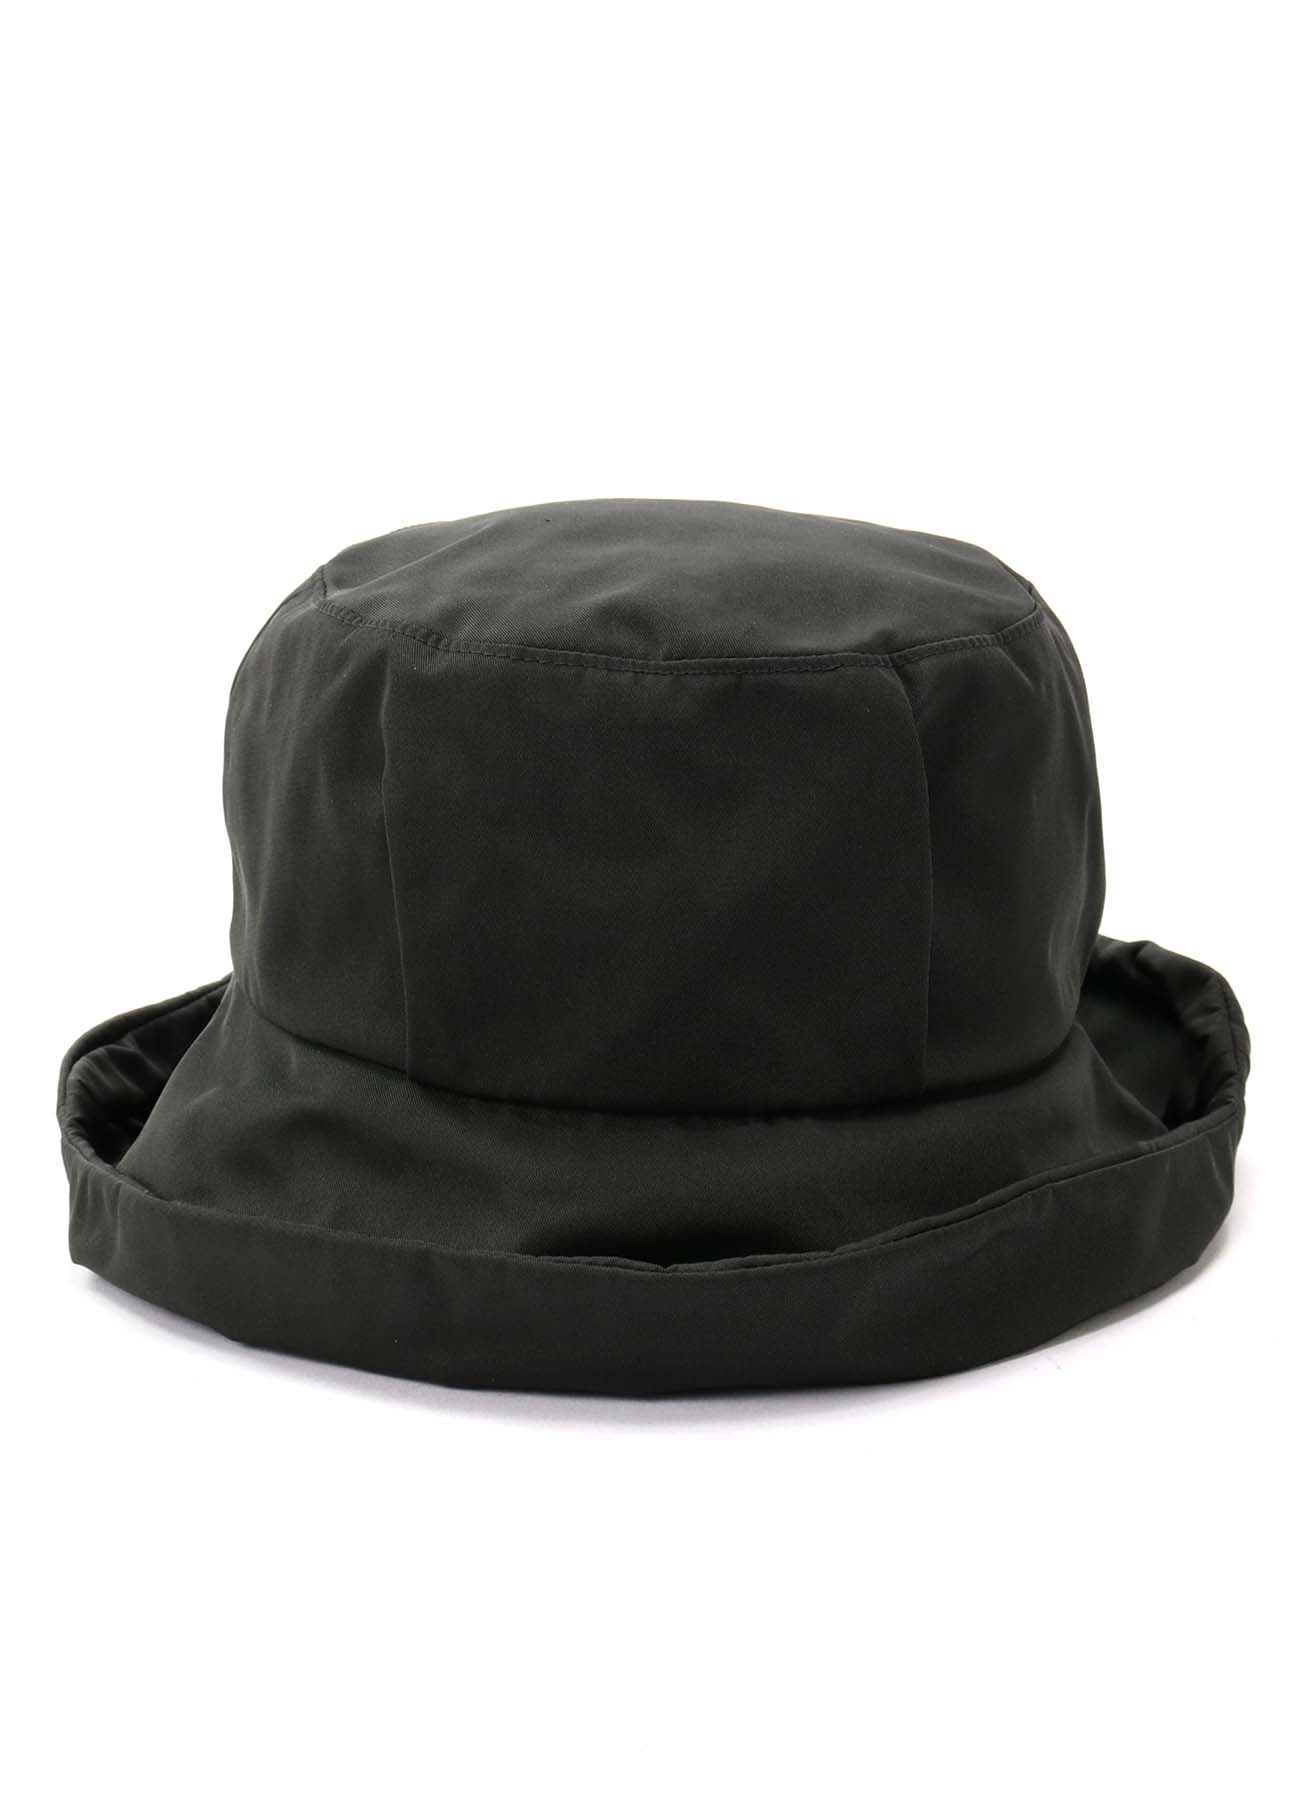 MEMORY POLYESTER MEMORY HAT